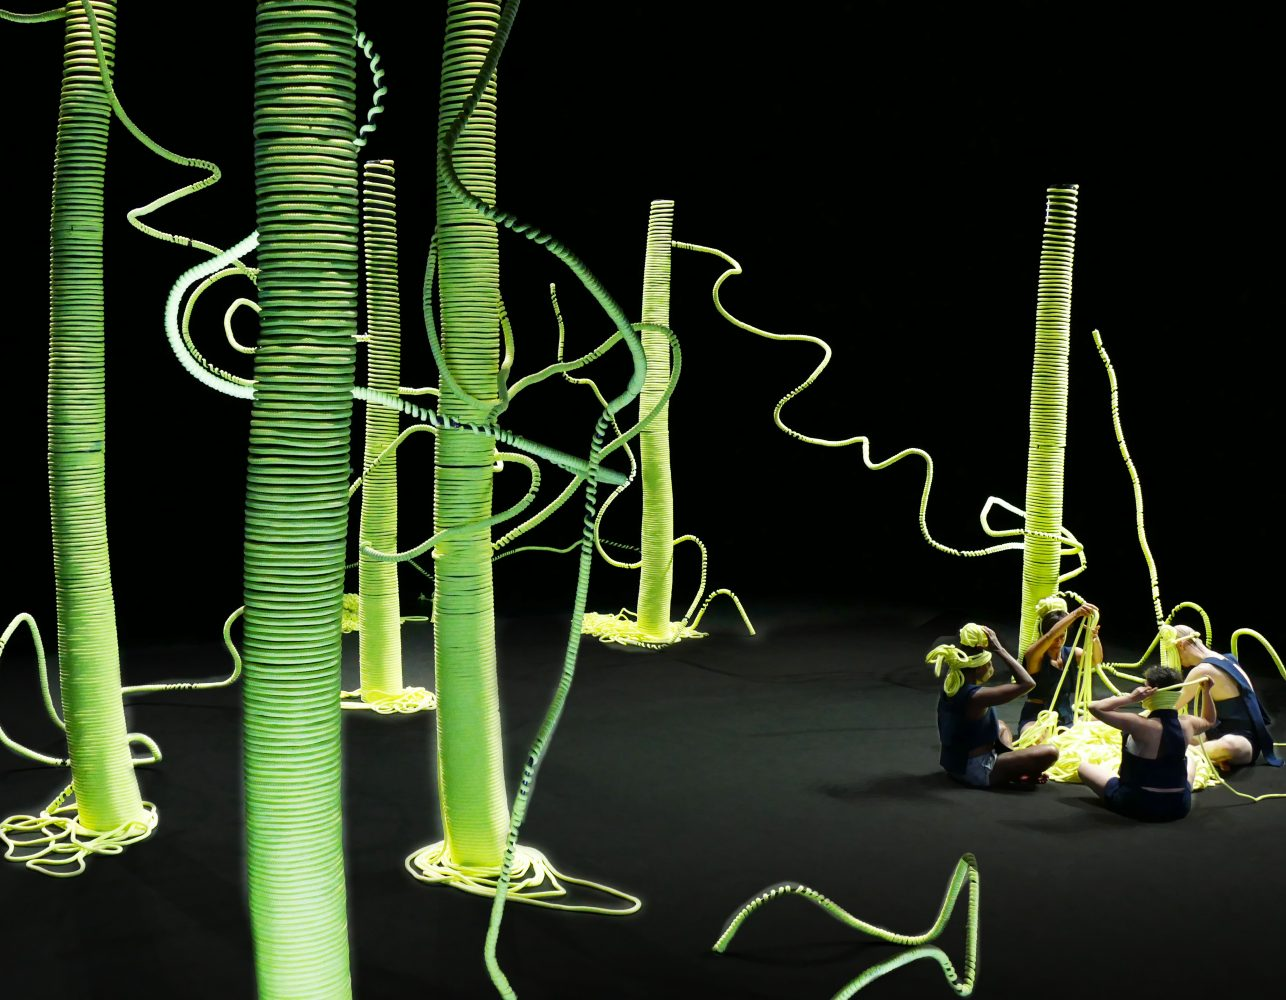 Nadia Lauro – Electric jungle - Electric jungle 2019